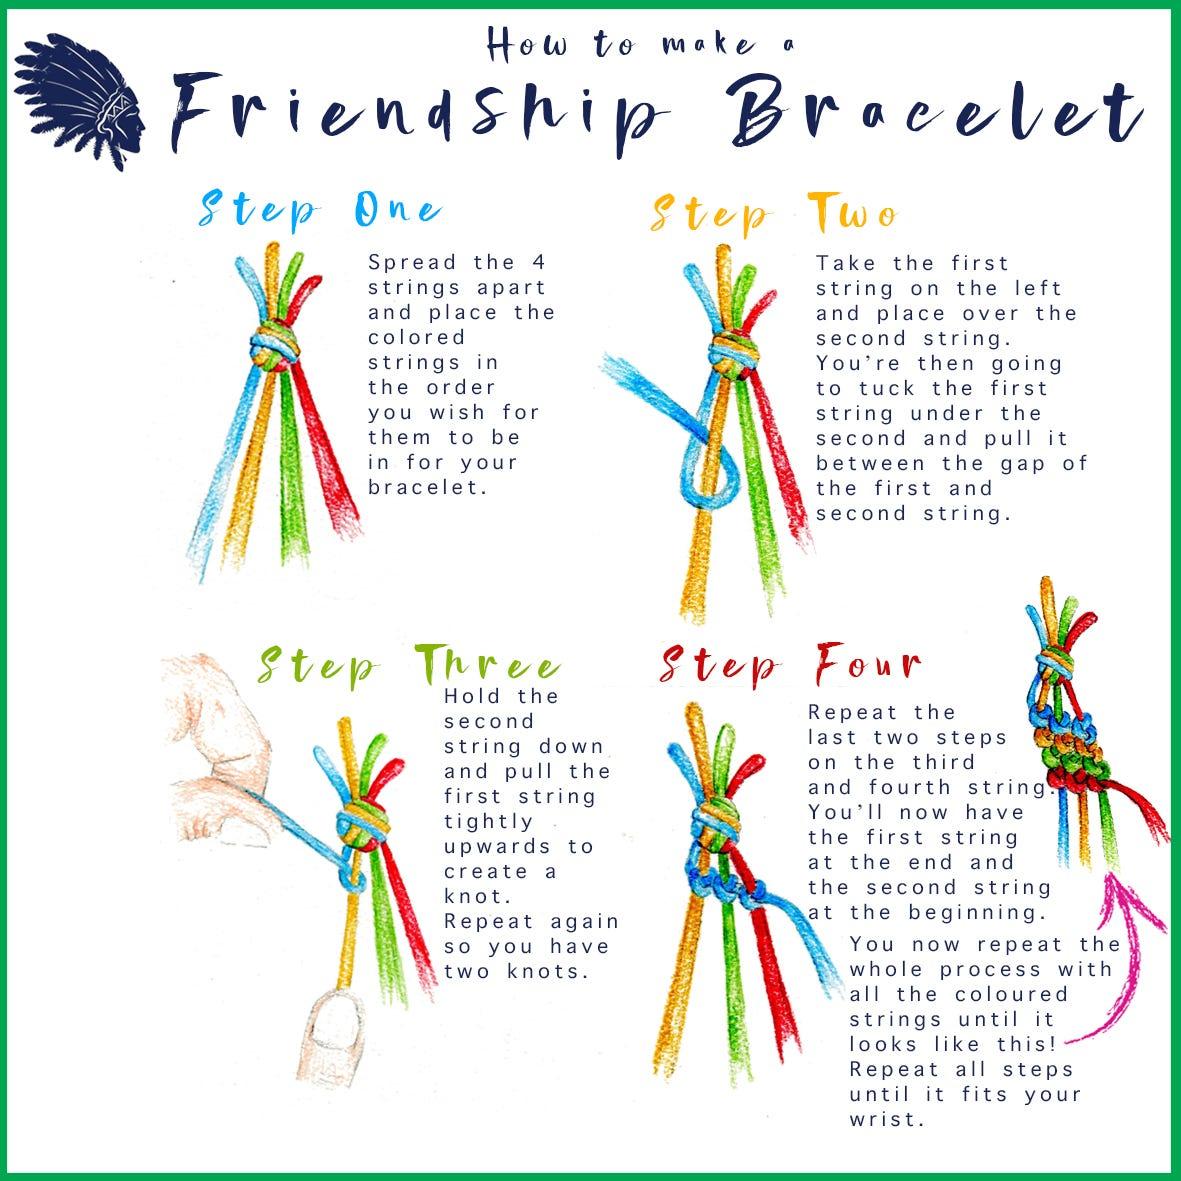 printable friendship bracelets instructions